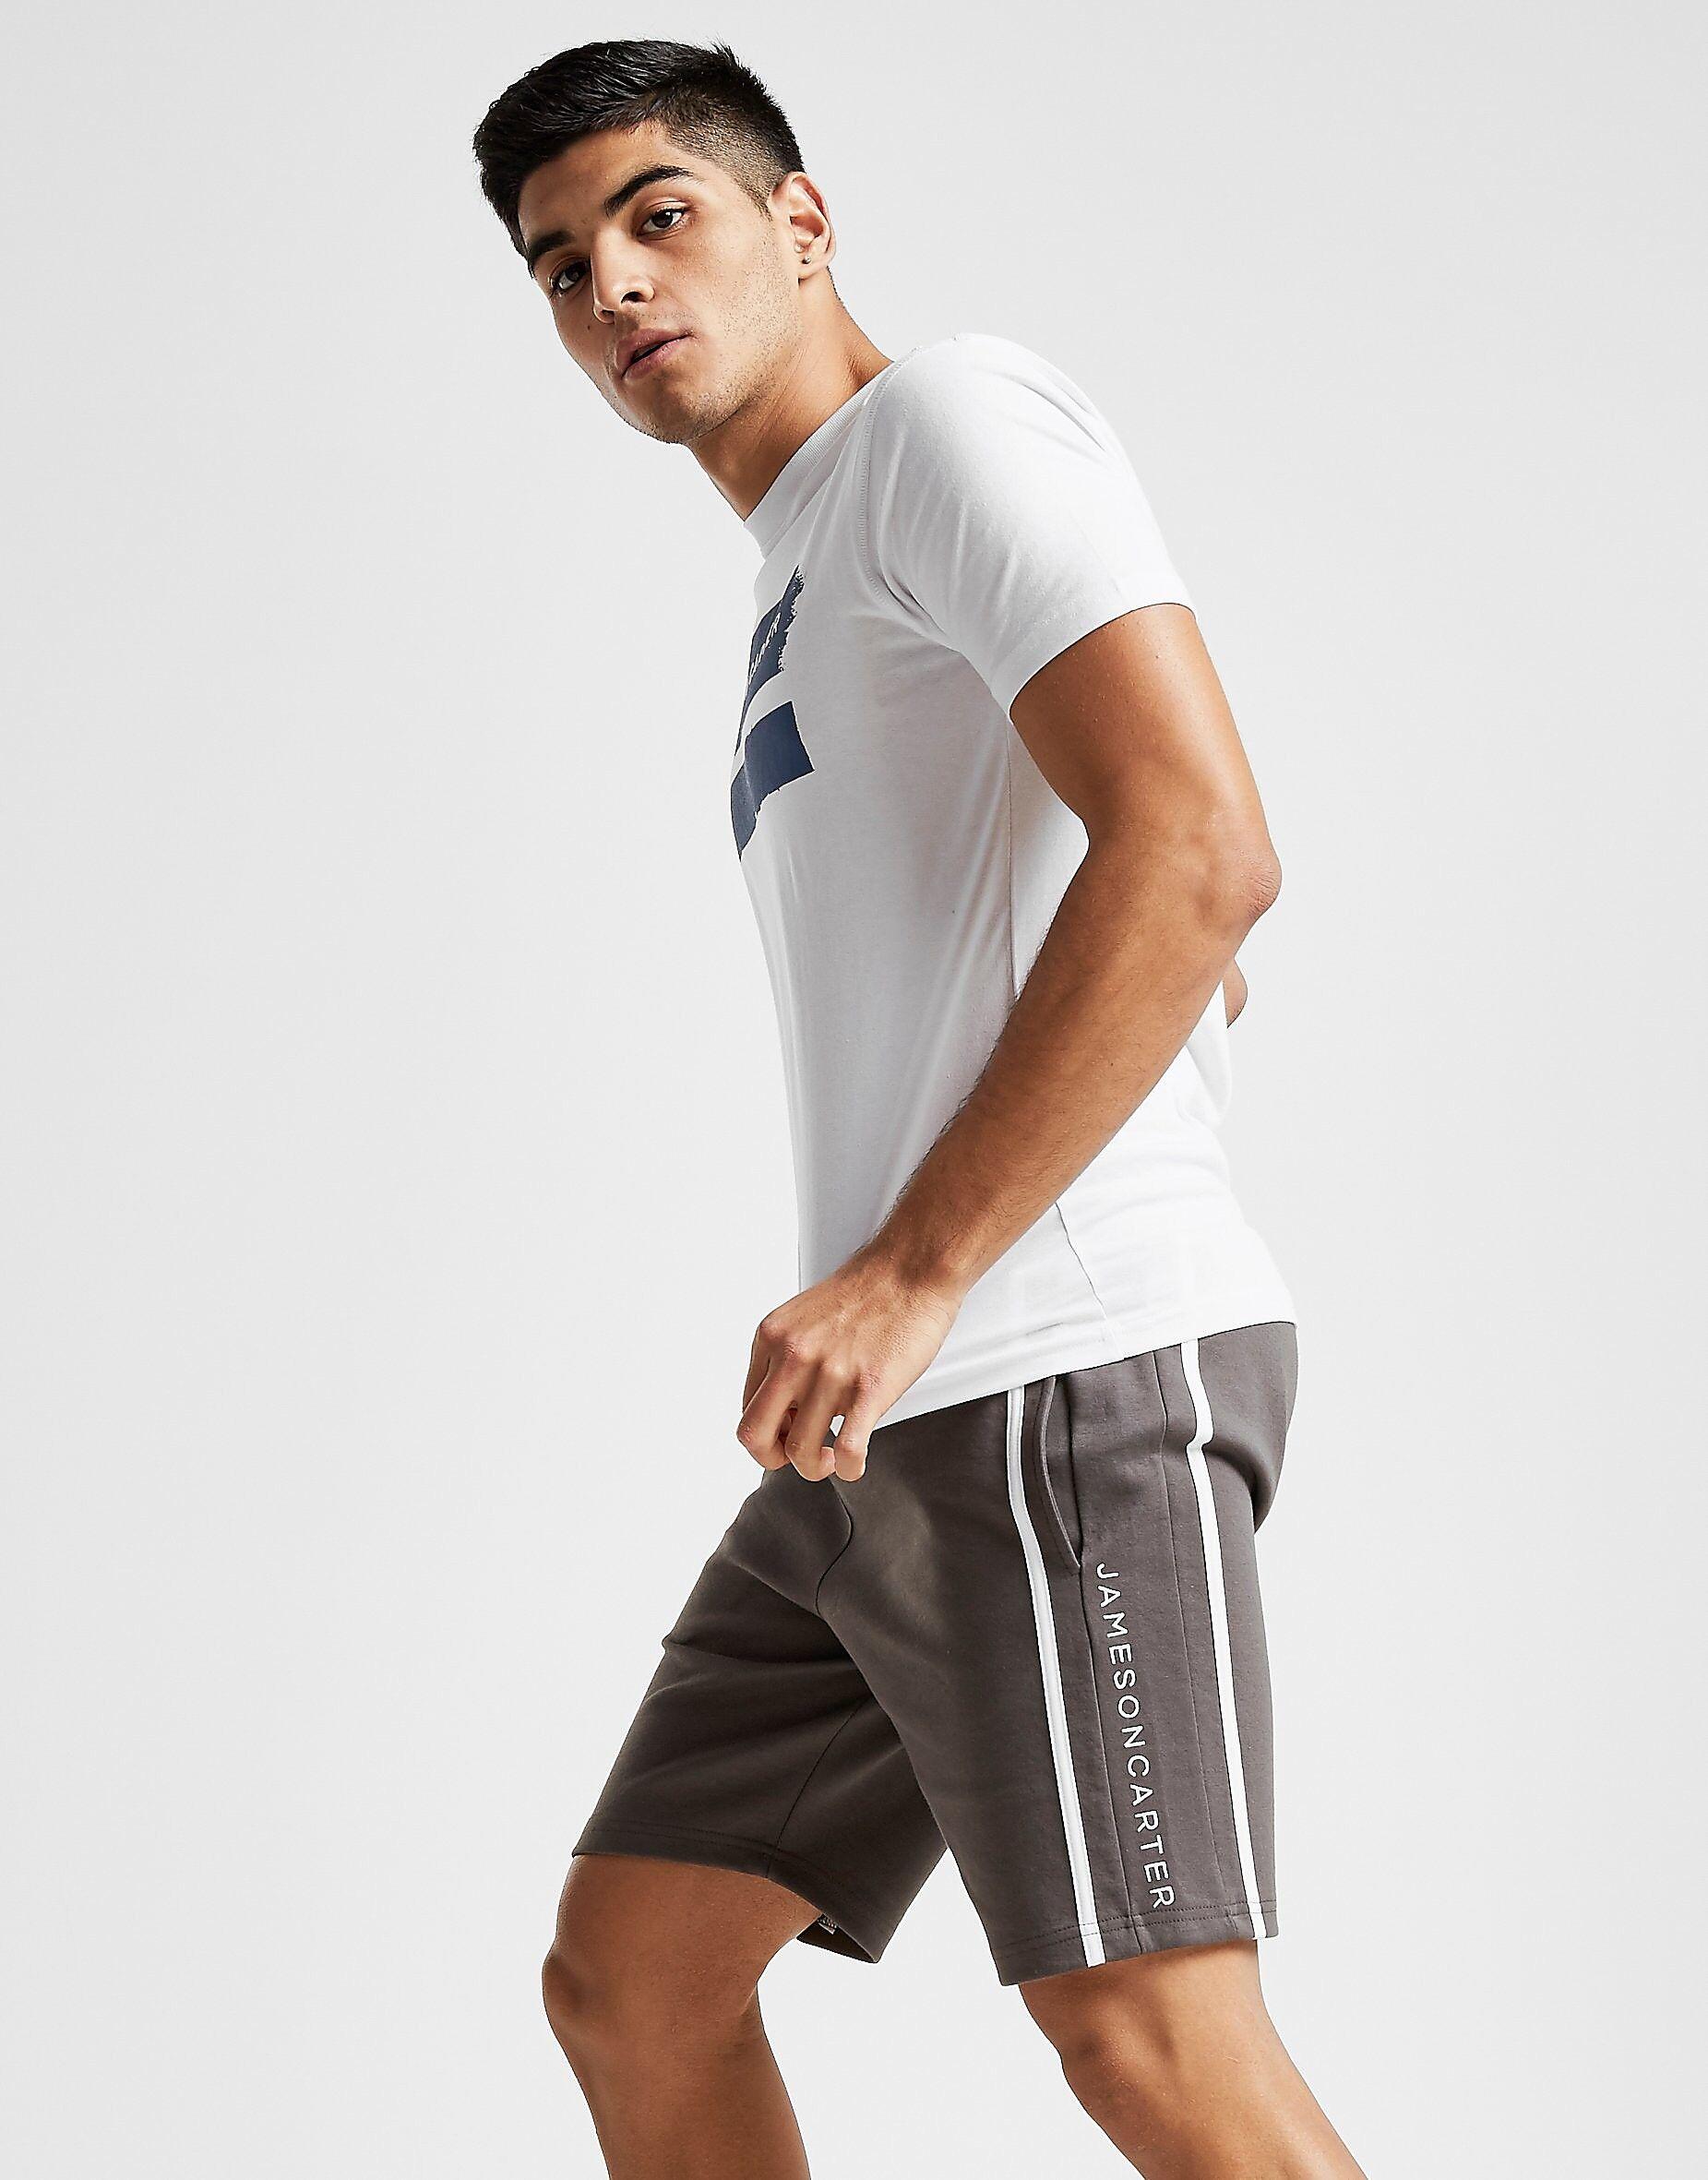 Image of JAMESON CARTER Giltspur Shorts - Only at JD - Mens, Harmaa